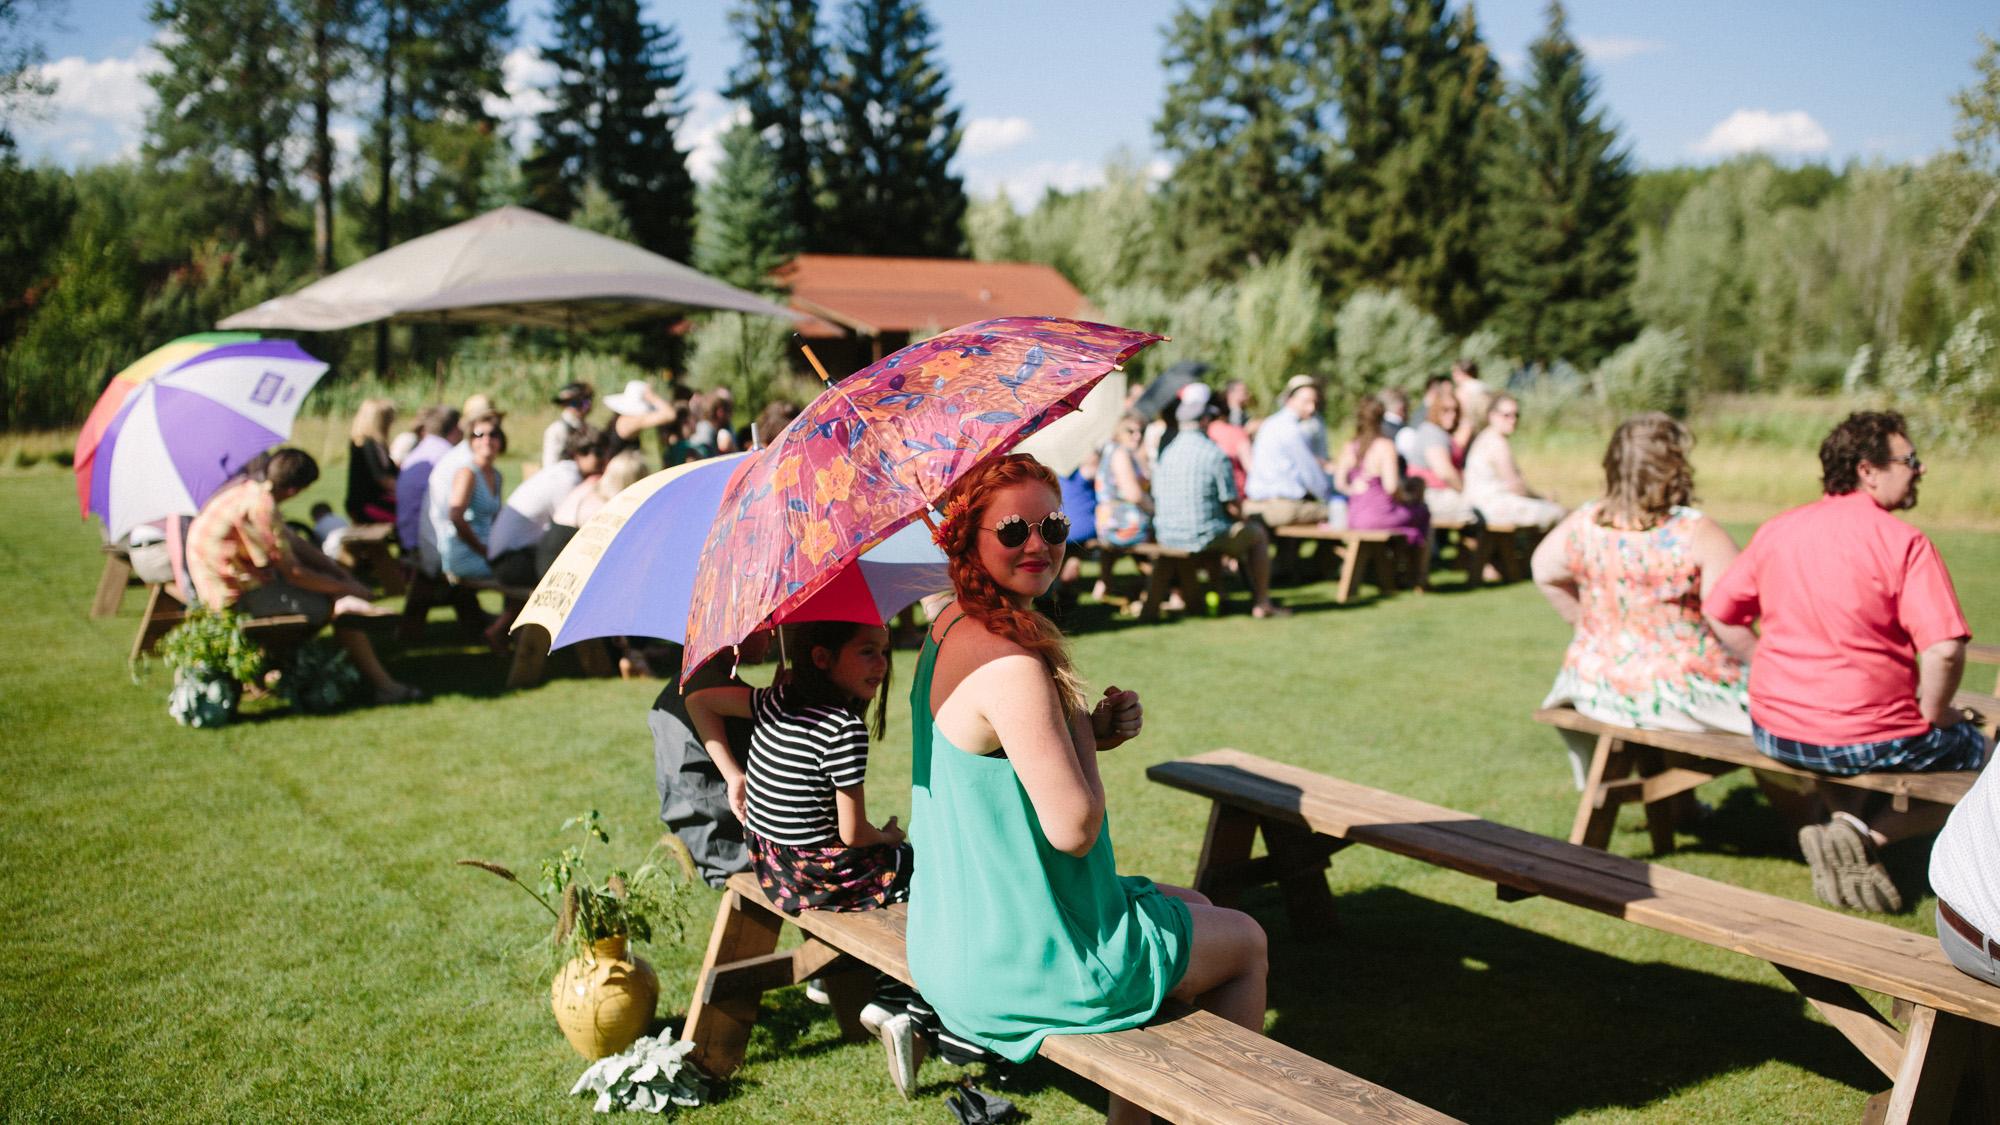 Montana_Wedding_Photos_alec_vanderboom-0079.jpg